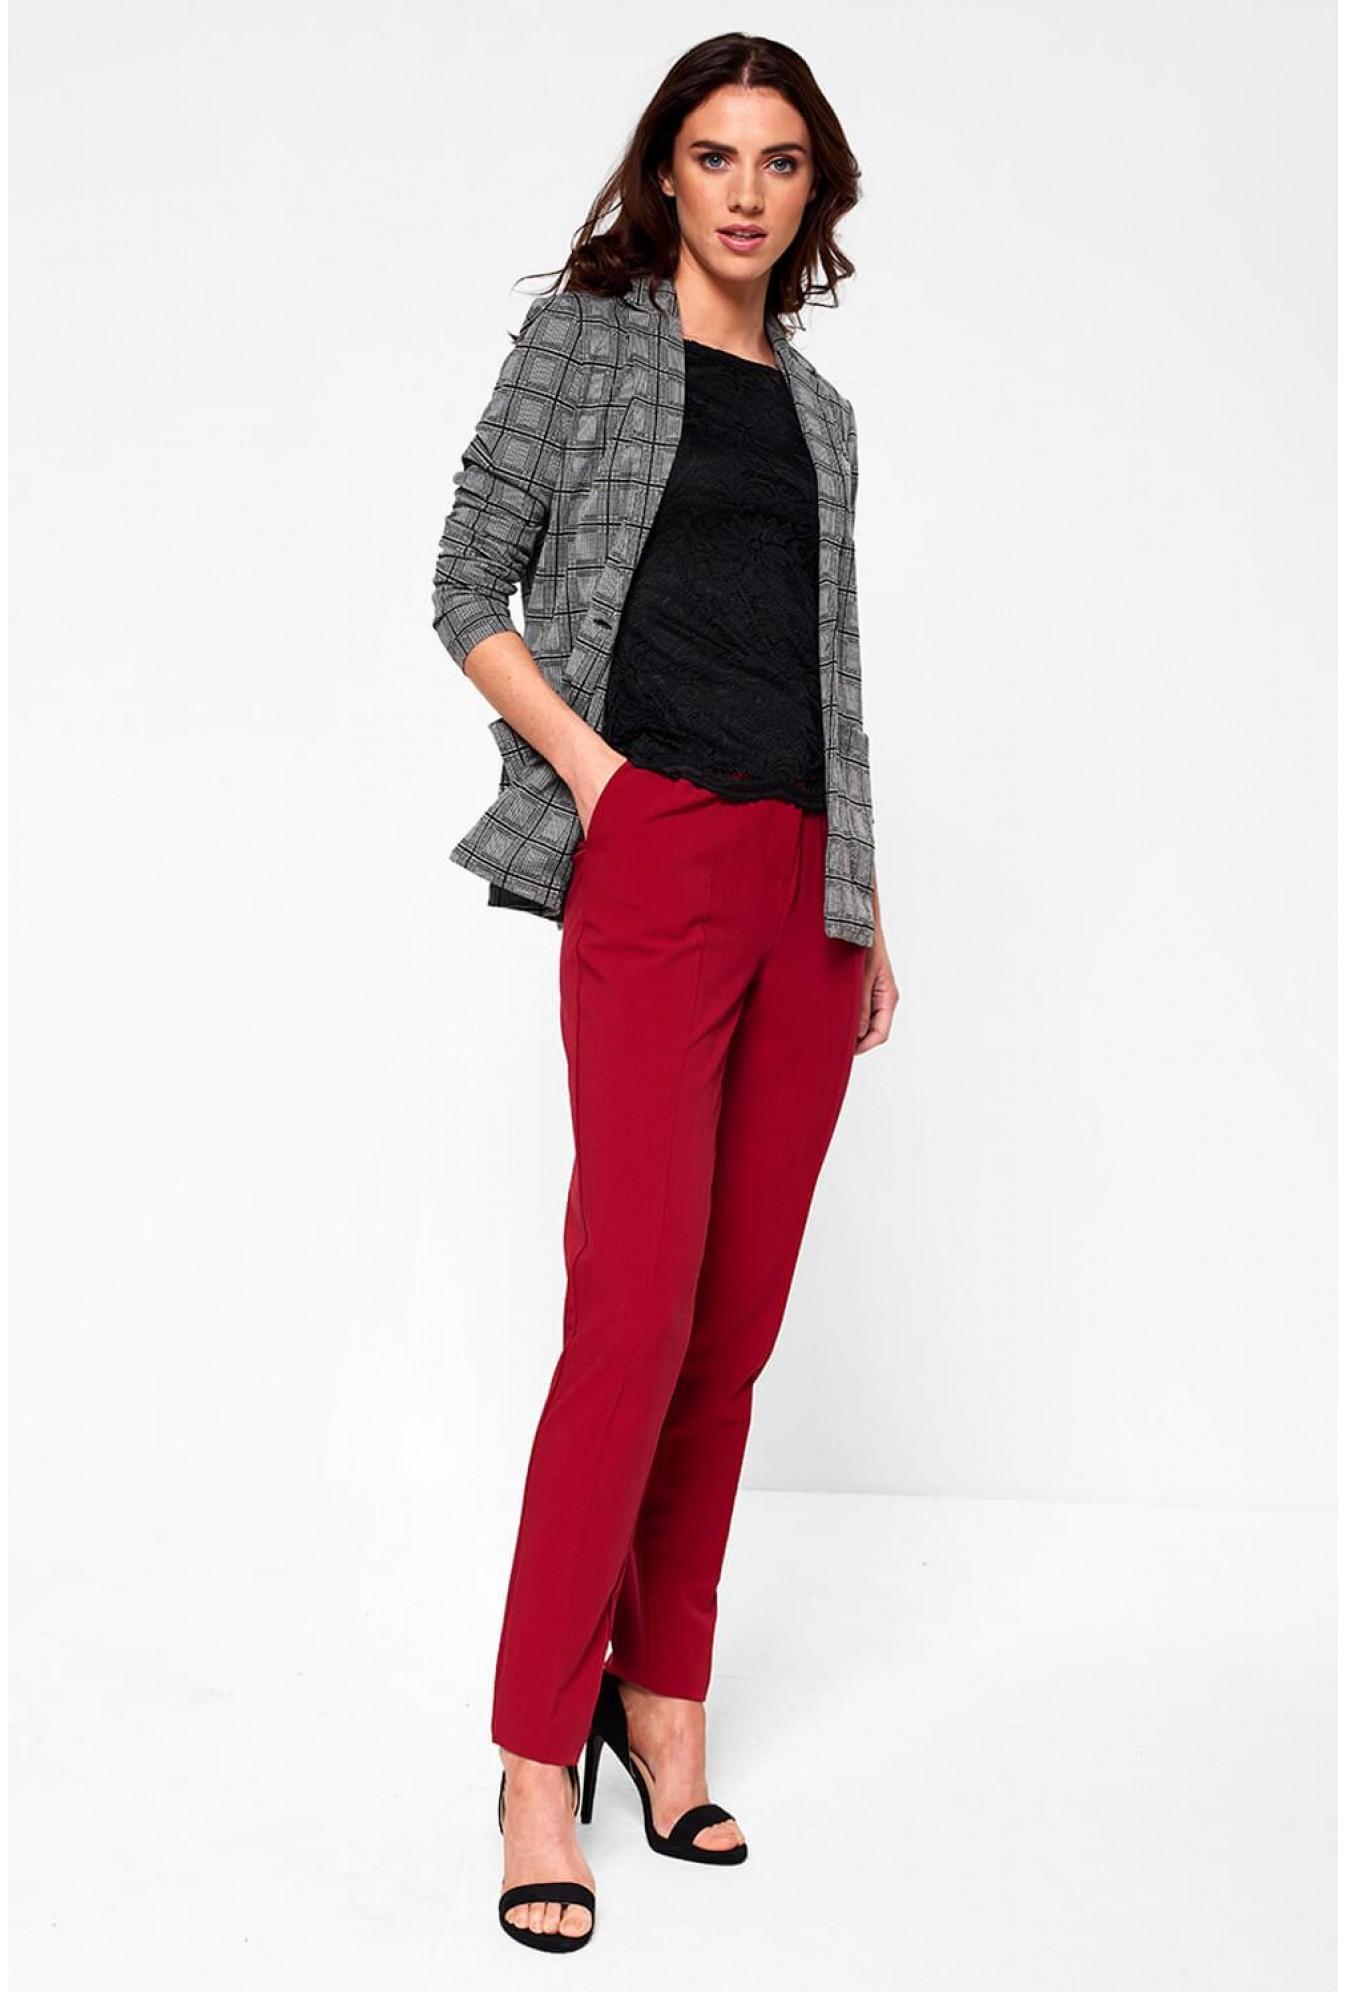 Vero Moda Ladies Sandra One Shoulder Top Black Various Sizes Brand New Free P/&P